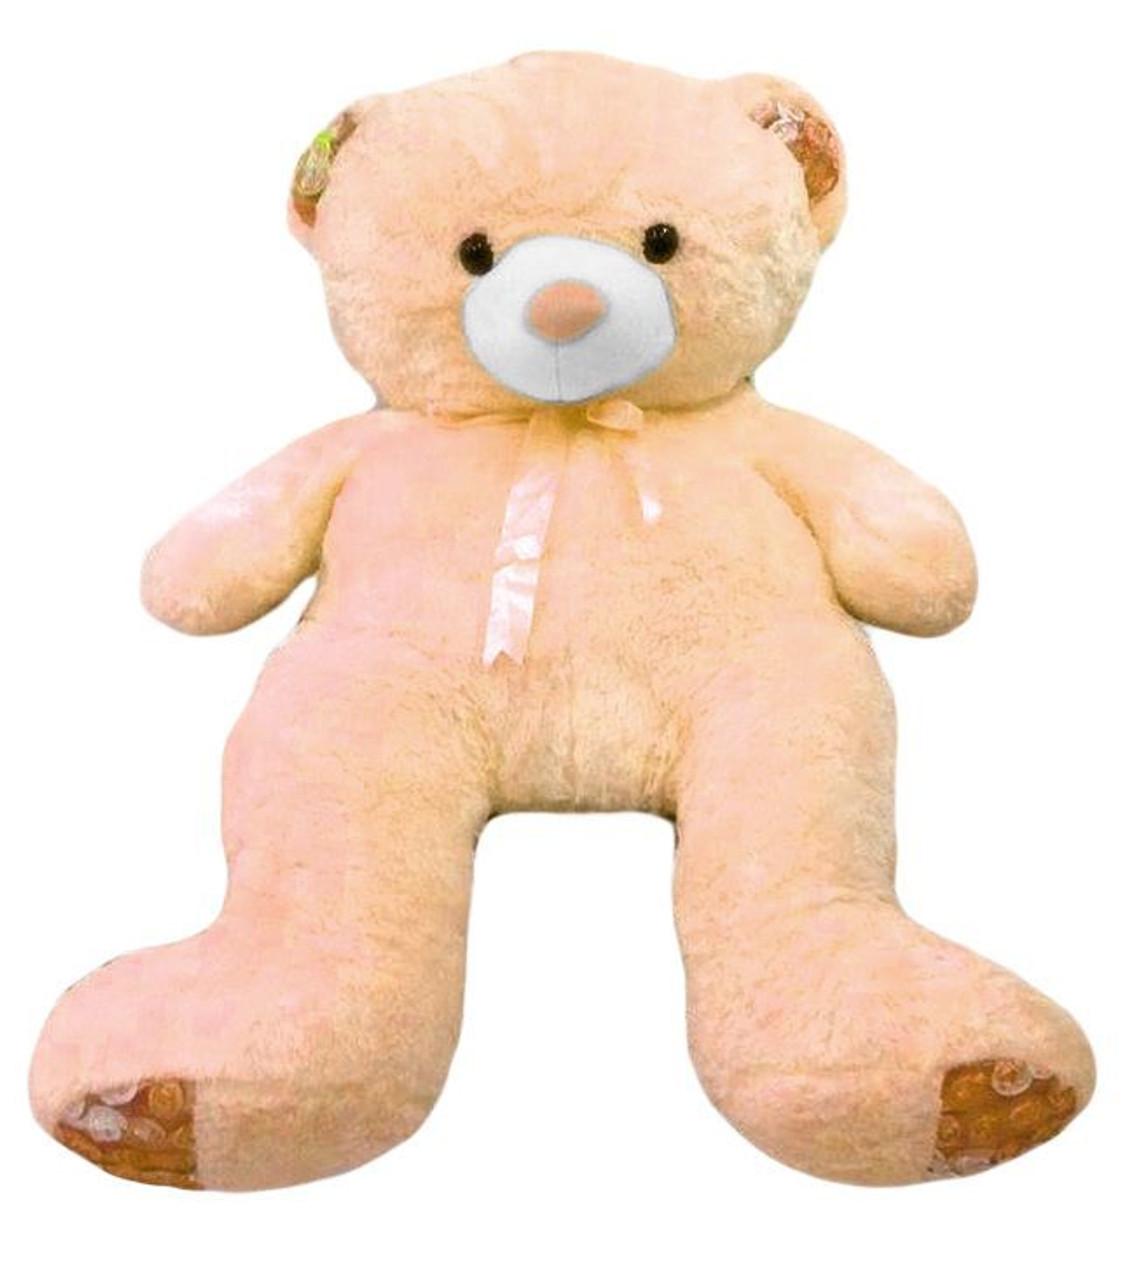 Human size 4'6 ft. Cream Teddy Bear - Best Seller